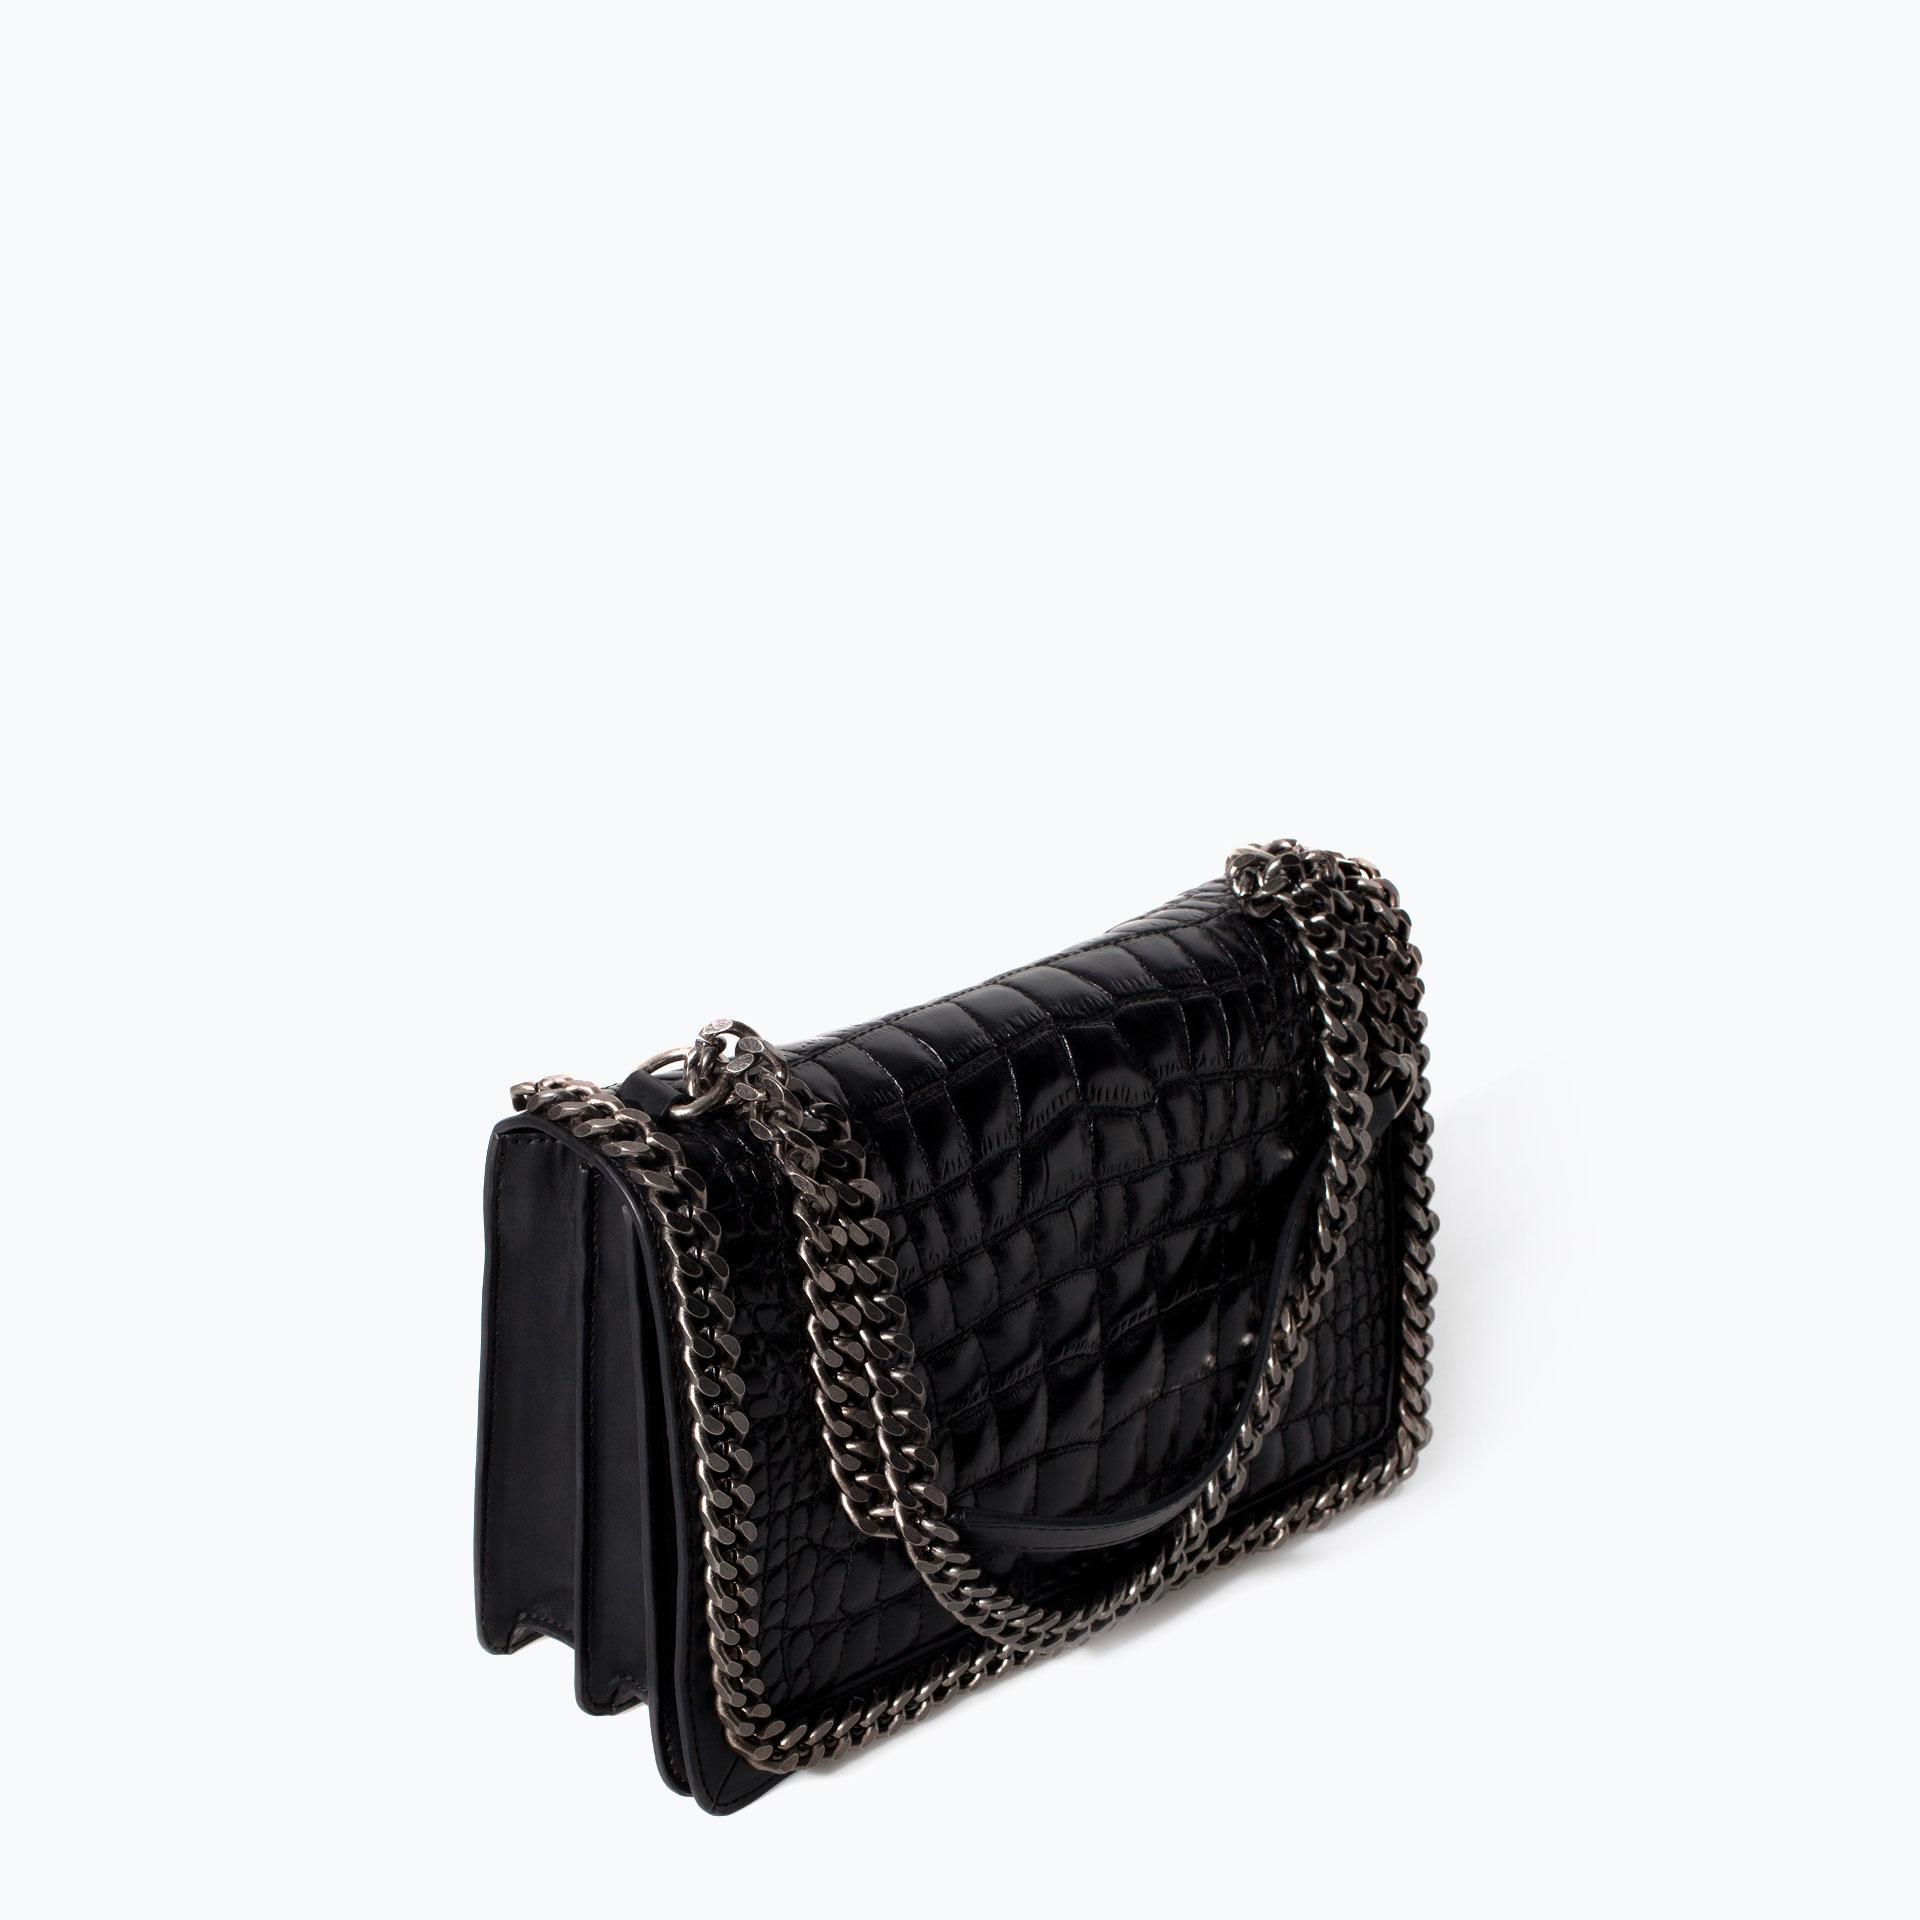 ae74e26cd5ae CROC AND CHAIN CITY BAG - Handbags - WOMAN | ZARA United States